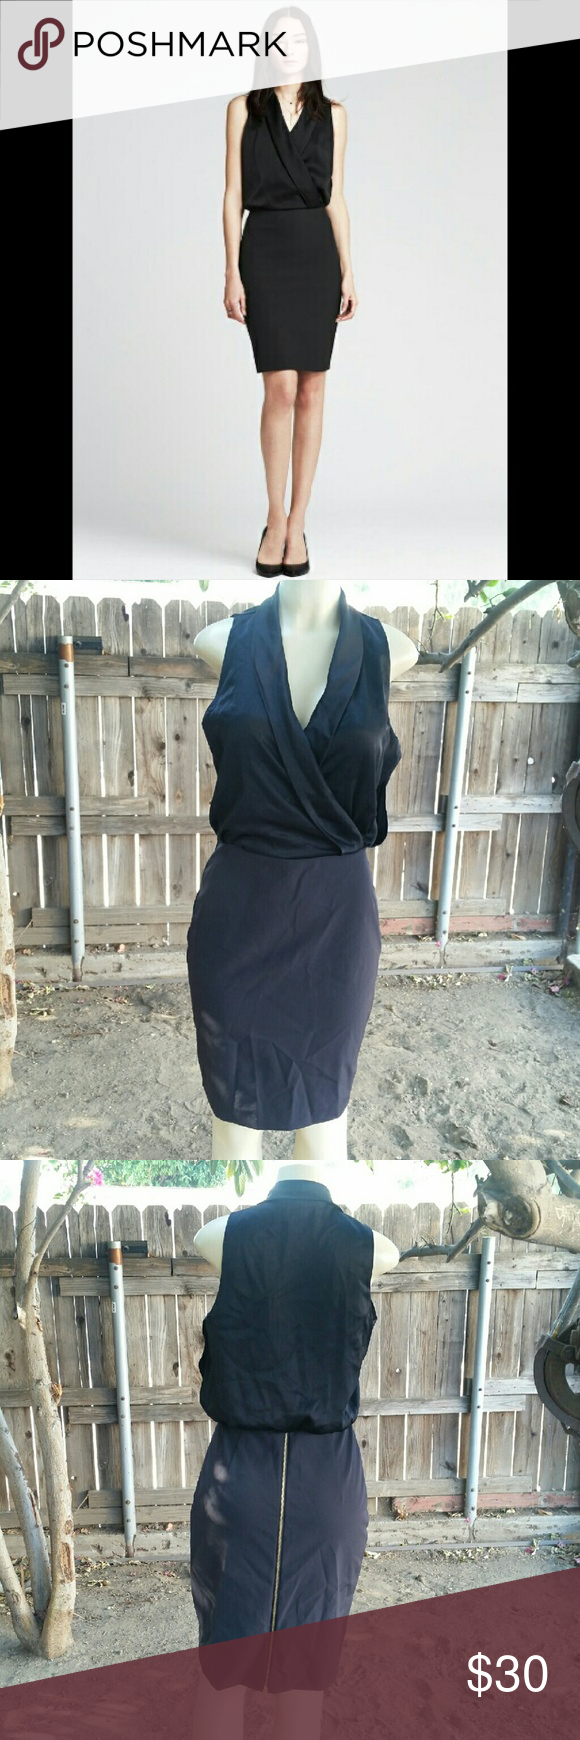 Draped classy dress Black dress with draped v neck and back zipper.. size 6 Great condition No flaws Banana Republic Dresses Mini